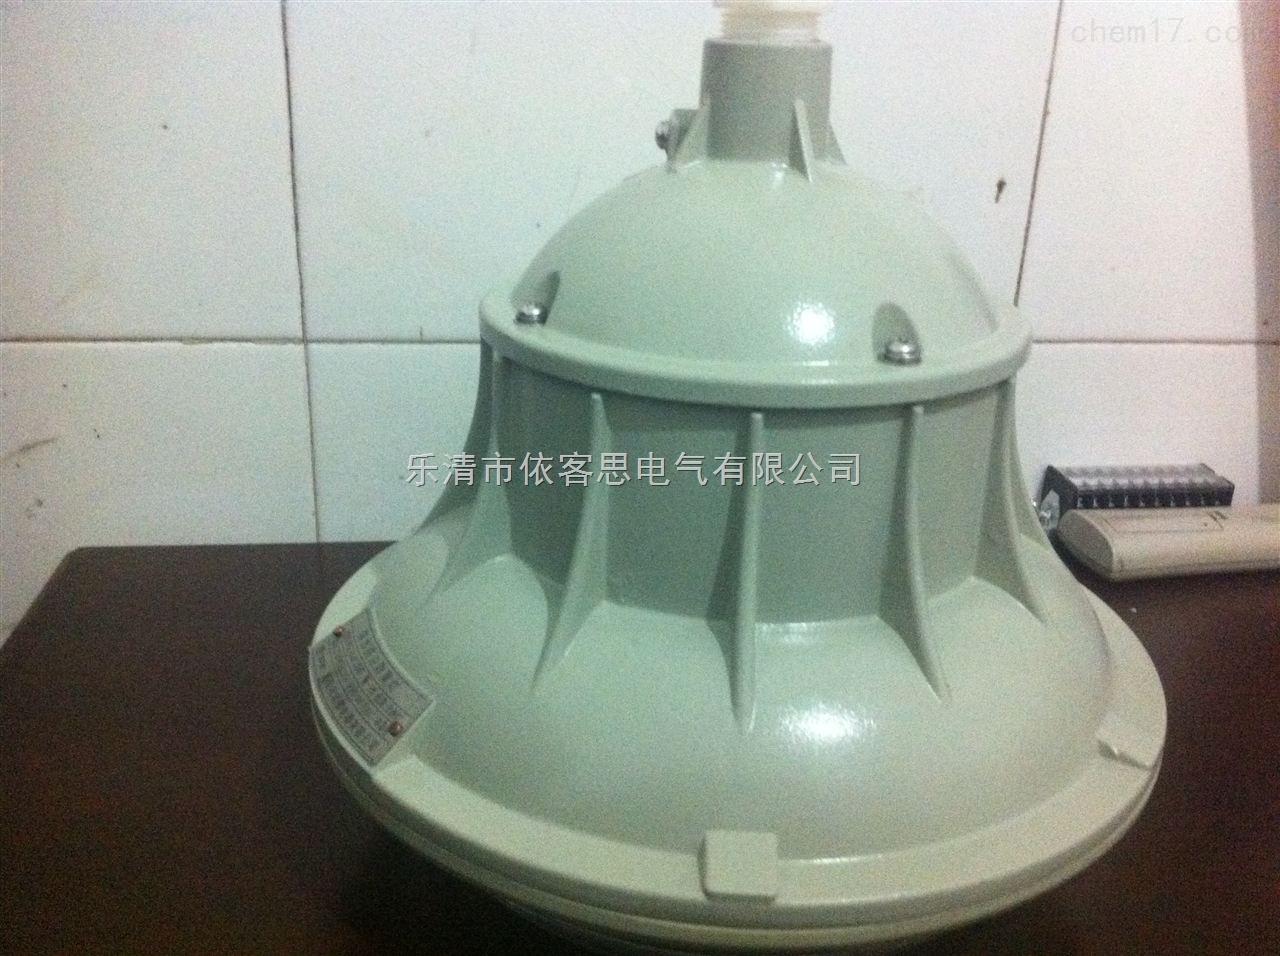 NFC9180 150W防炫通路灯(零售批发)铝合金压铸  钢化玻璃